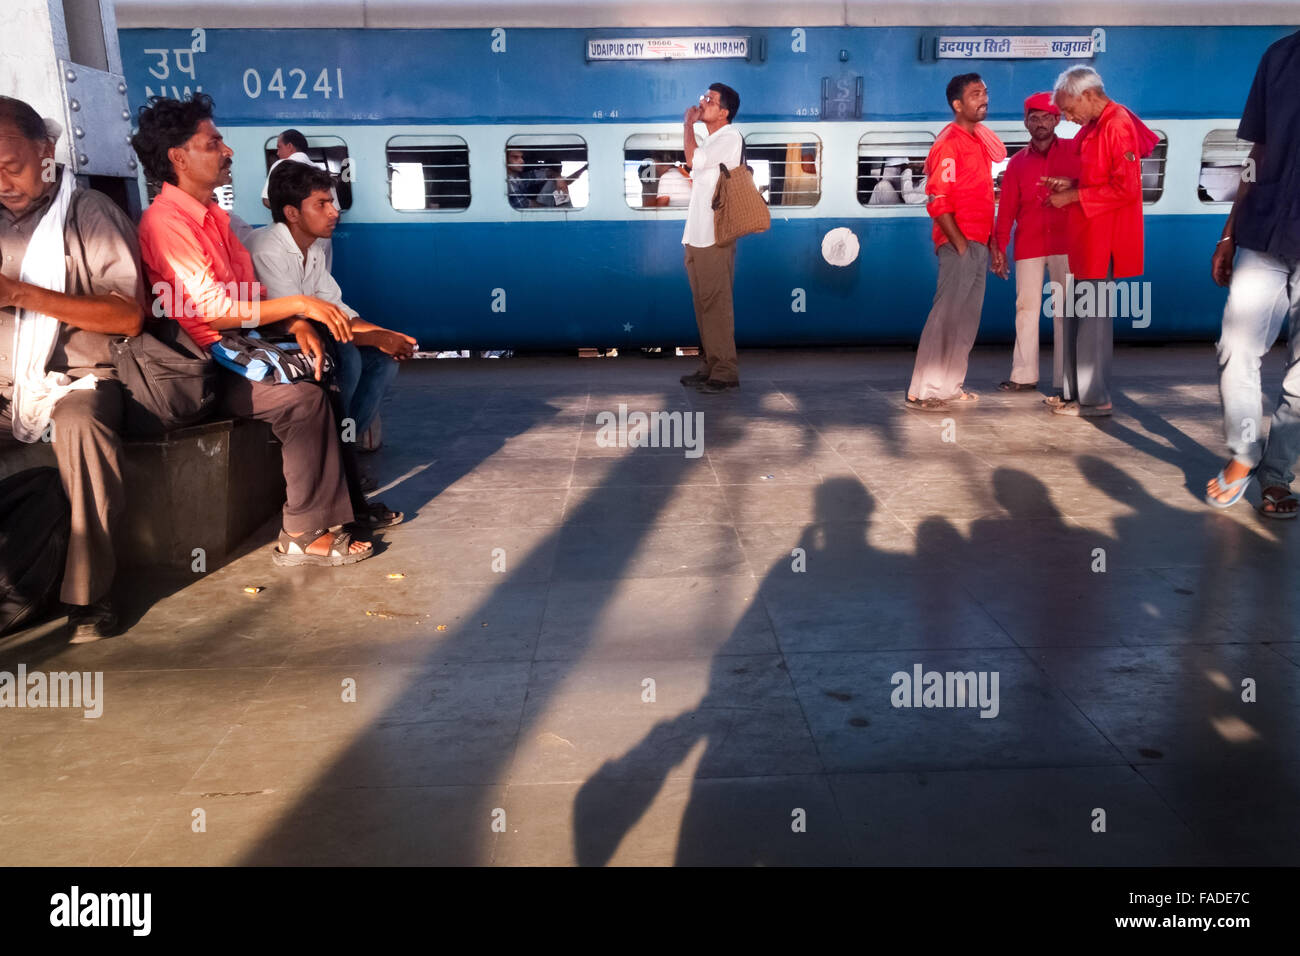 People at Varanasi train station platform. - Stock Image